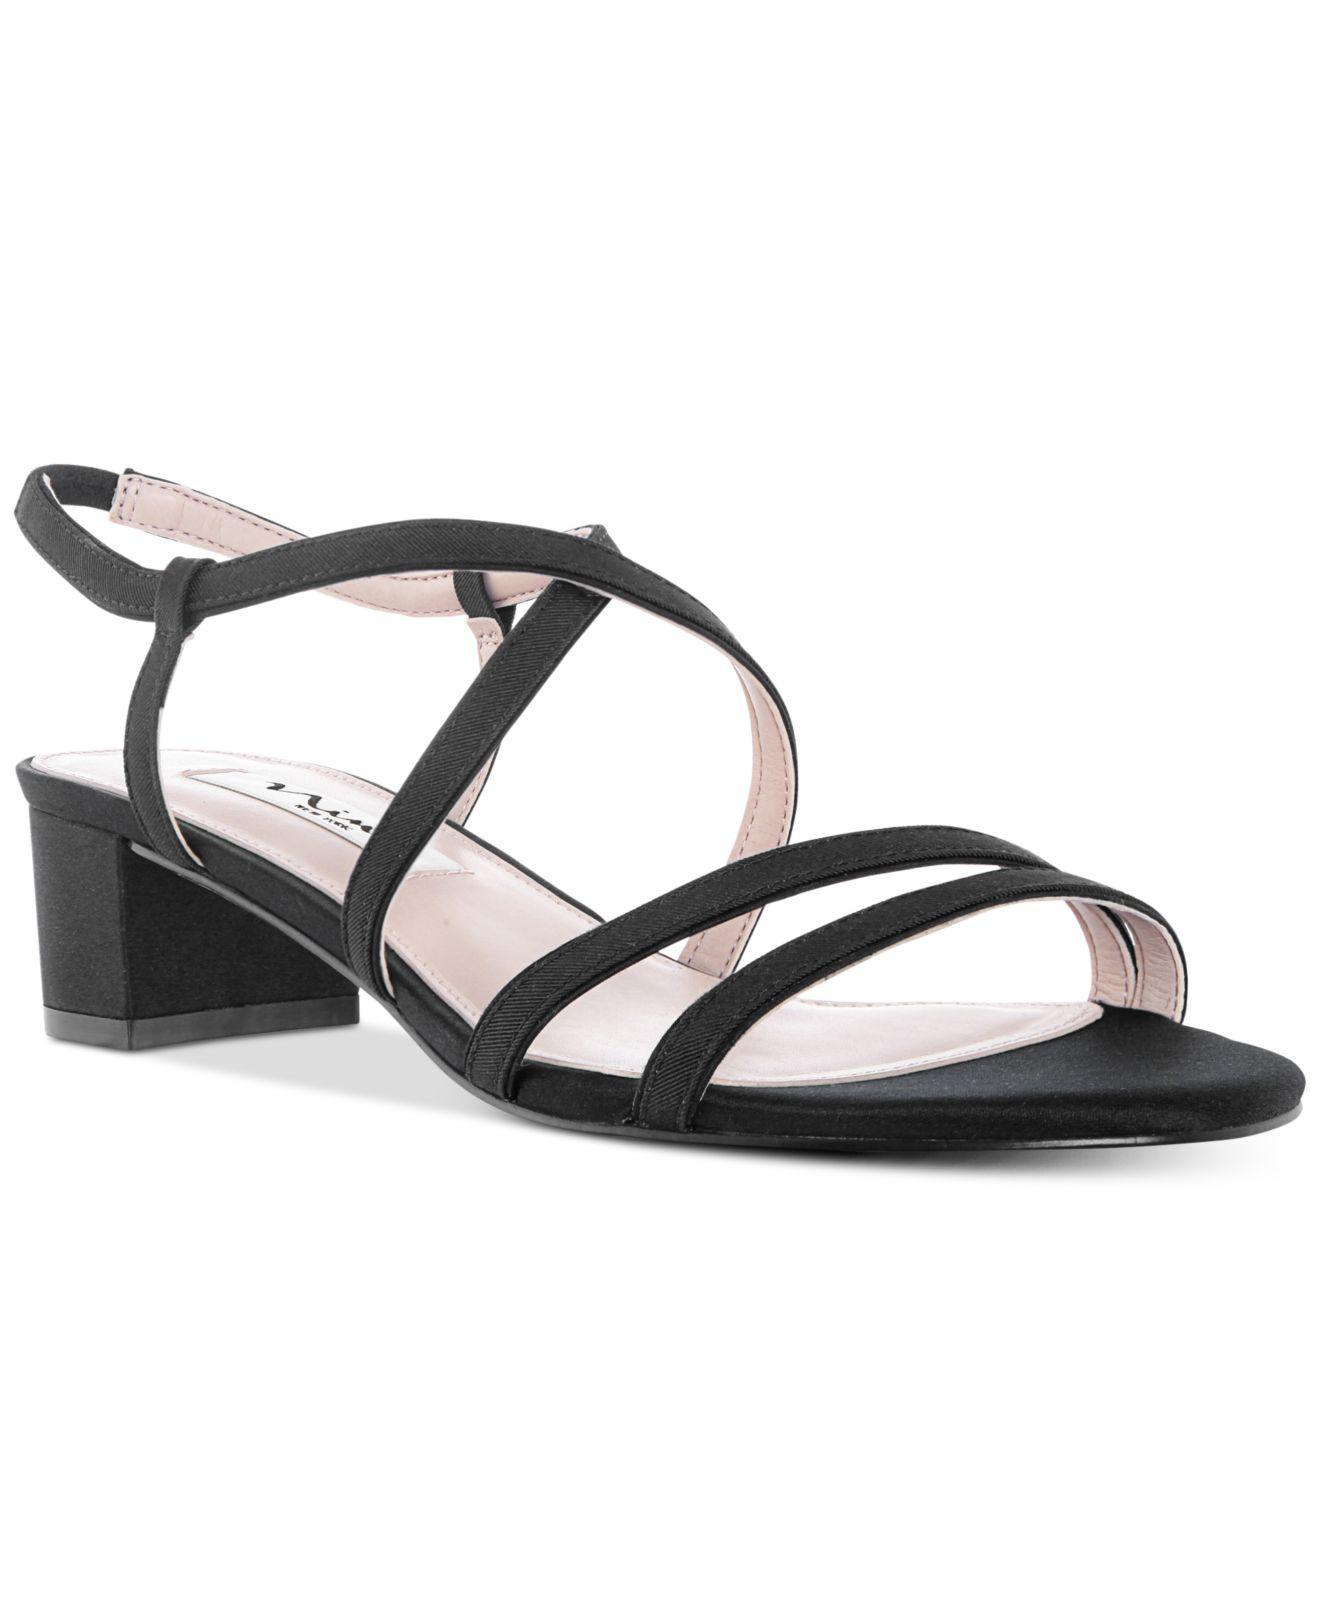 NINA Gaelen Evening Sandals Women's Shoes NhB5Q9R5G